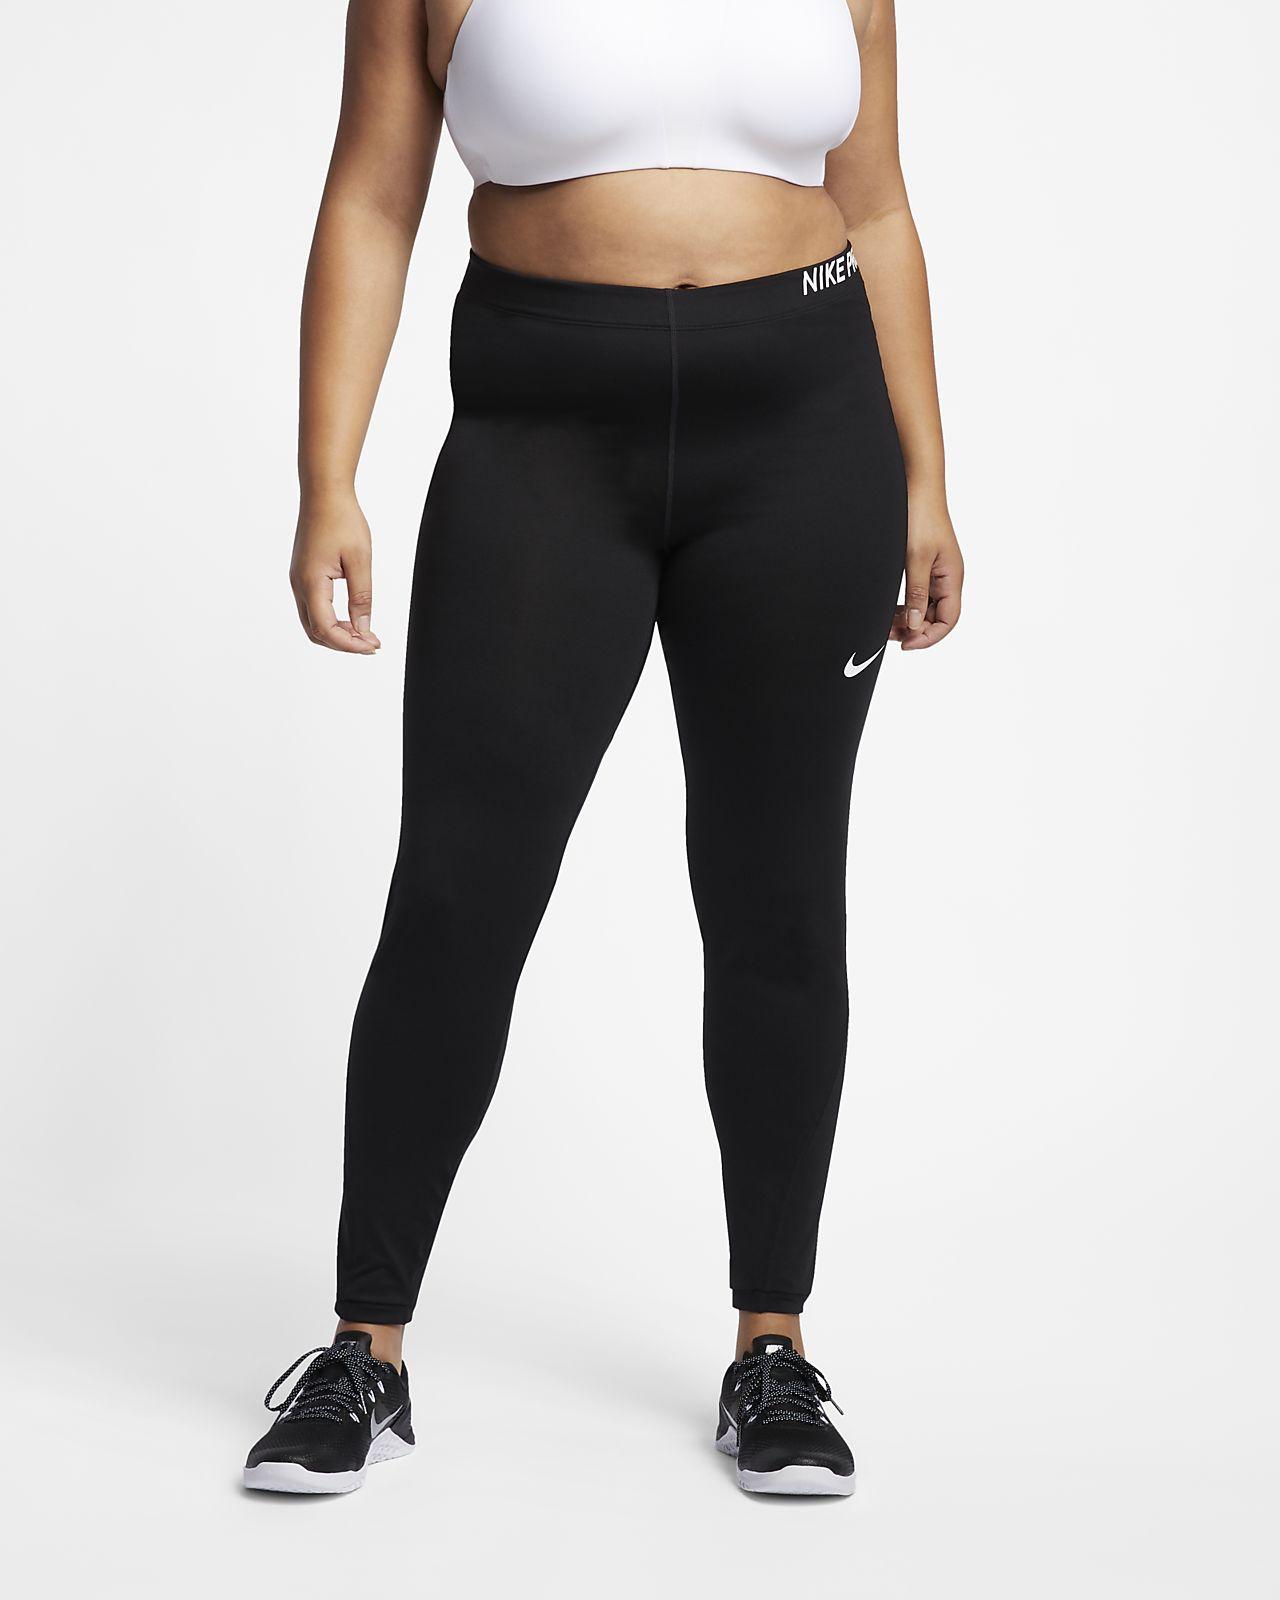 b069db66f8591 Nike Pro Women s Mid-Rise Training Tights (Plus Size). Nike.com CA